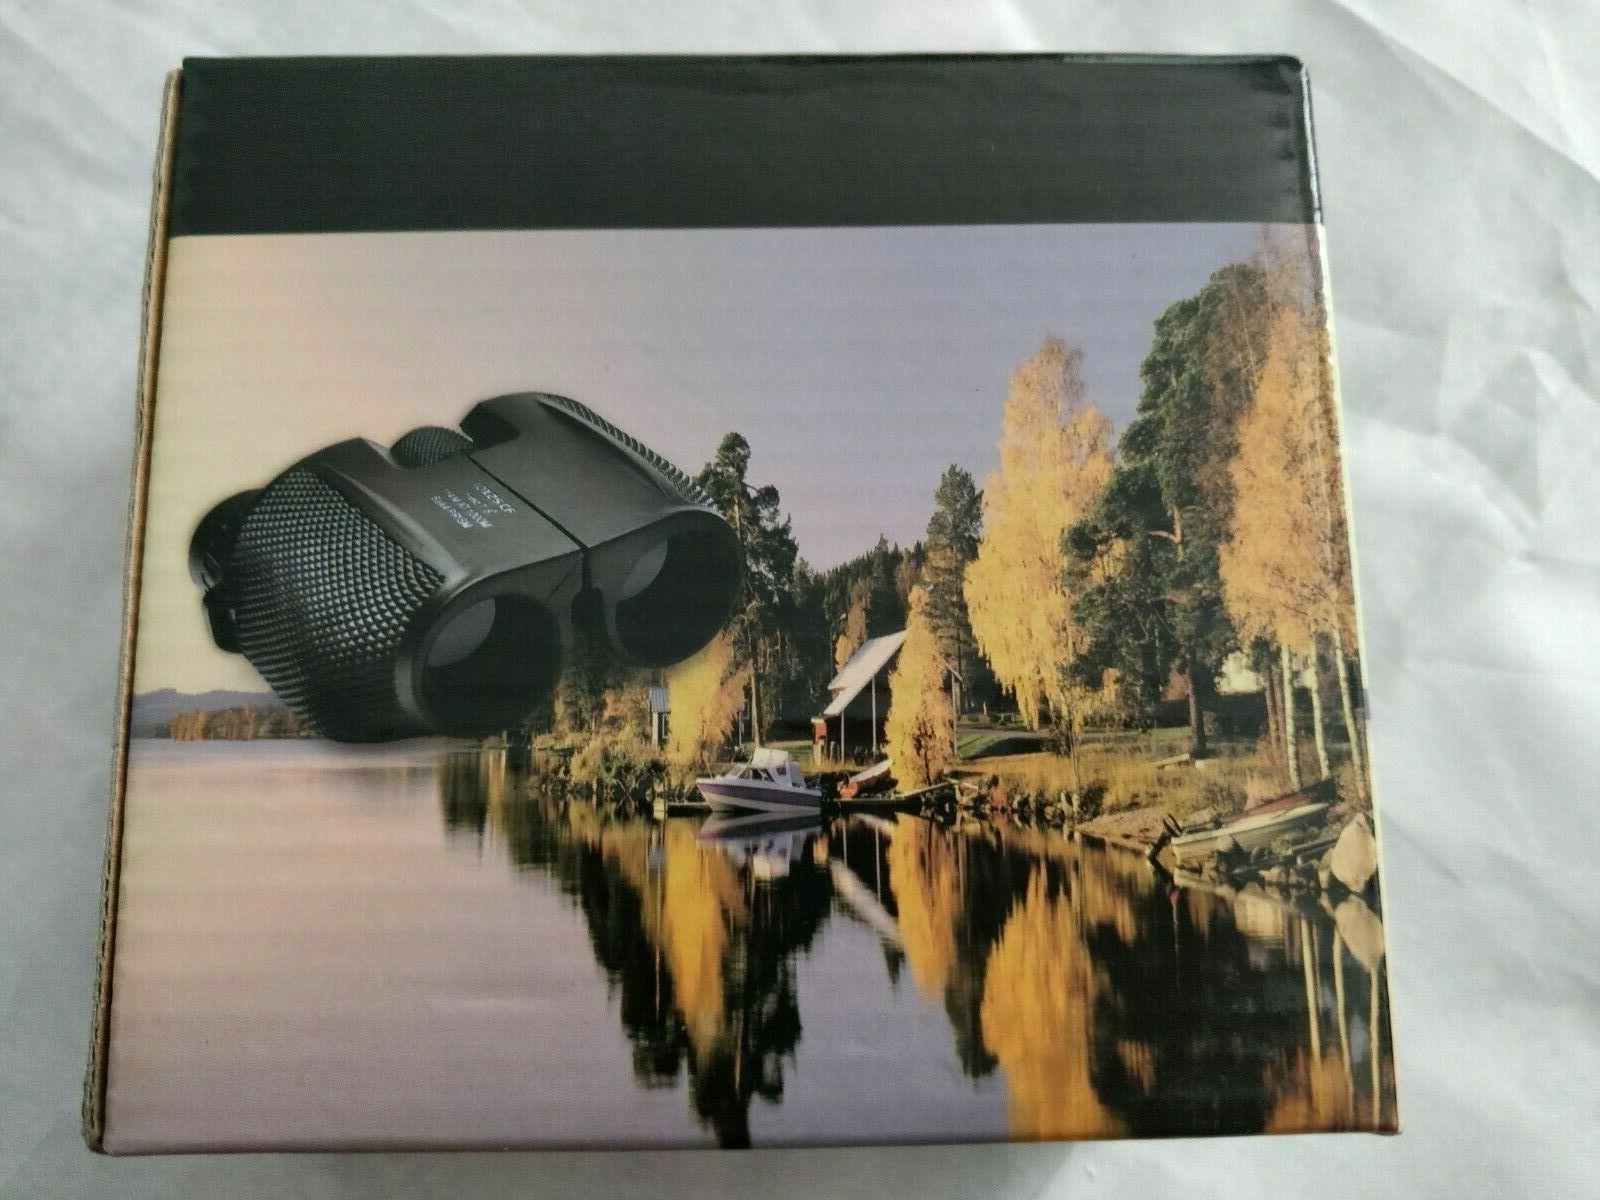 10x25 folding high powered binoculars perfect